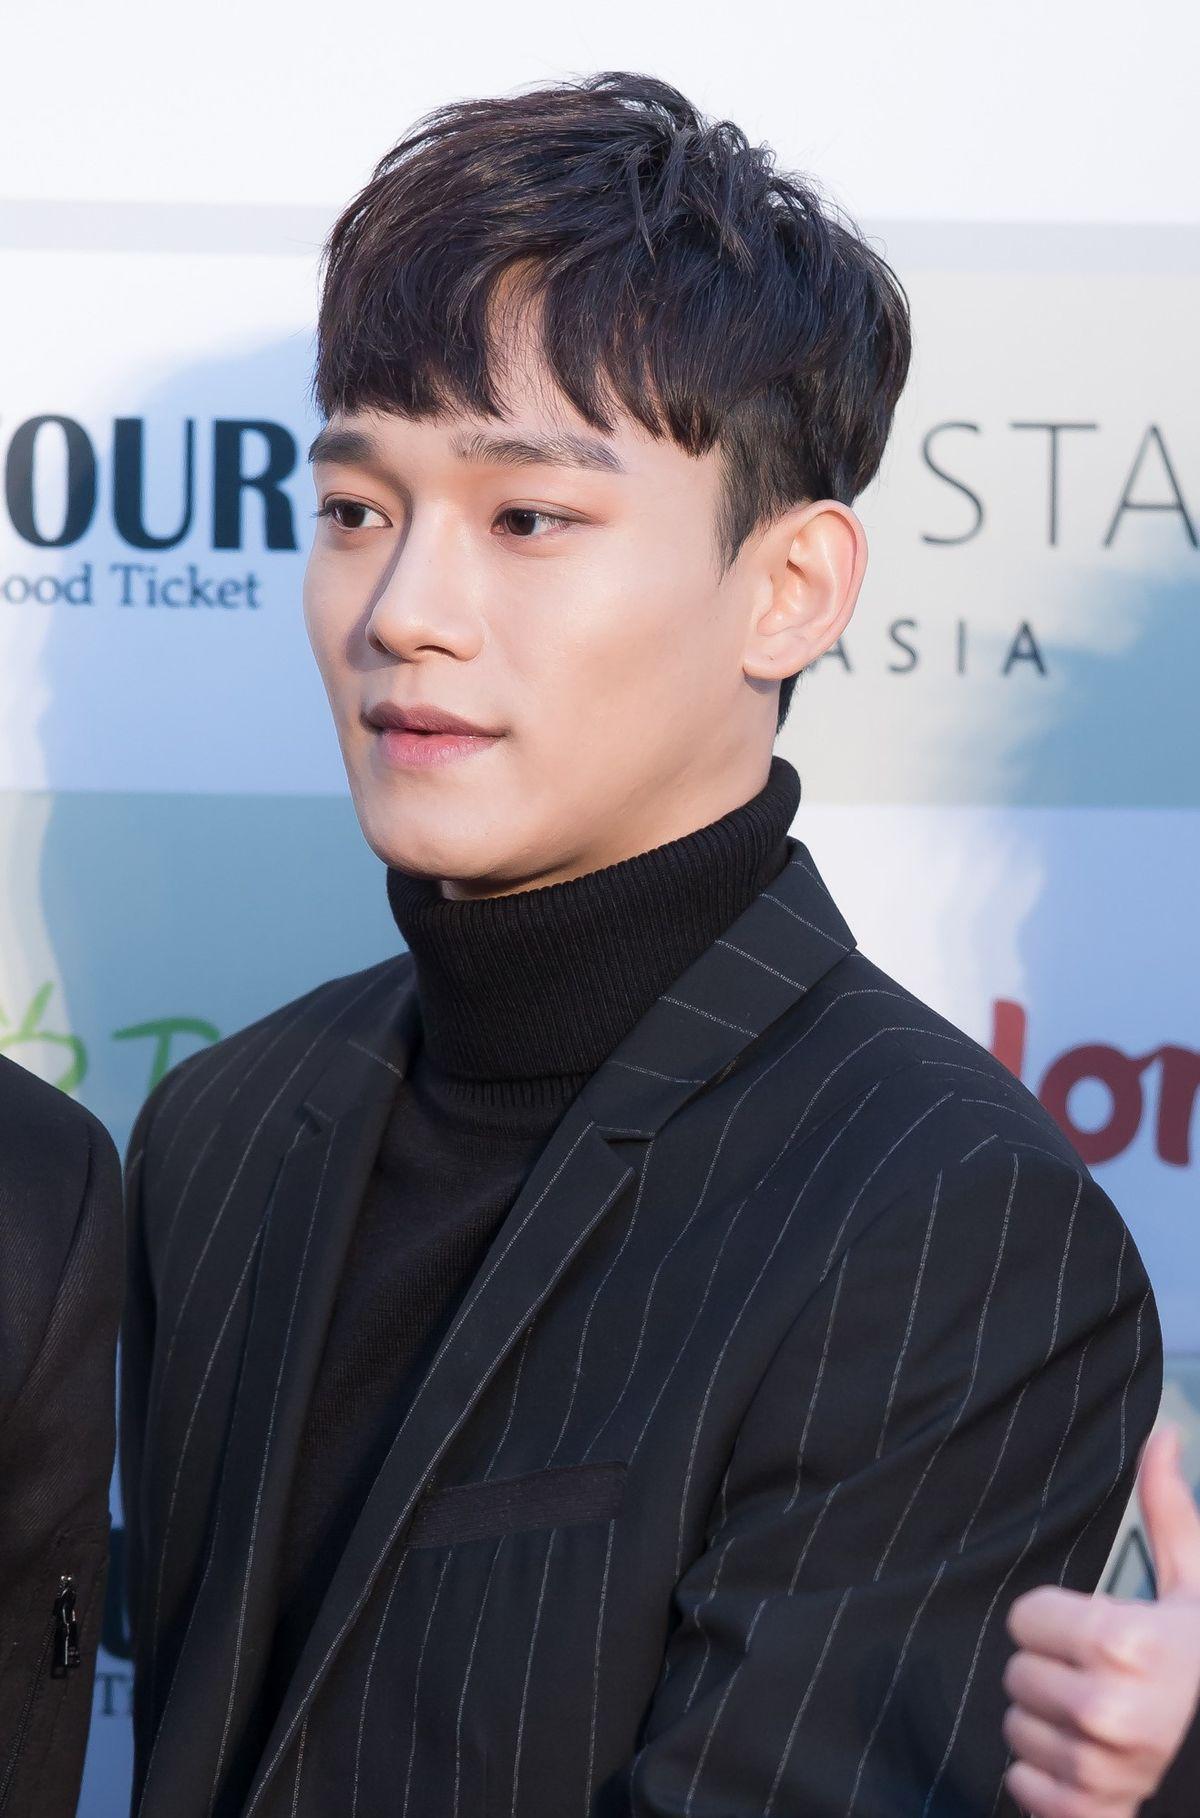 Chen Singer Wikipedia